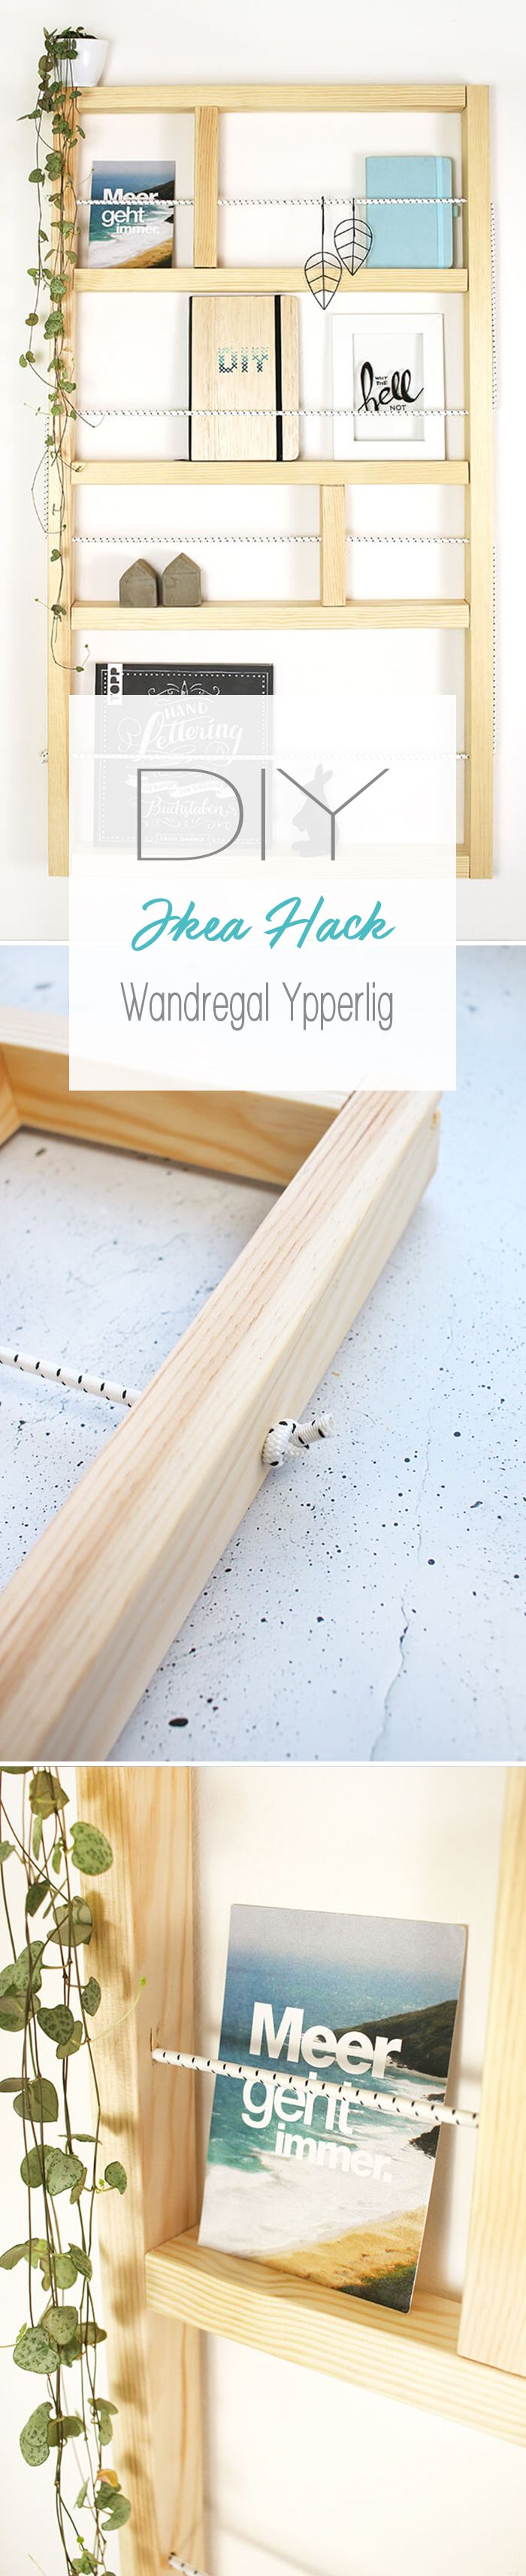 do it yourself ypperlig wandregal selbst nachbauen diy. Black Bedroom Furniture Sets. Home Design Ideas